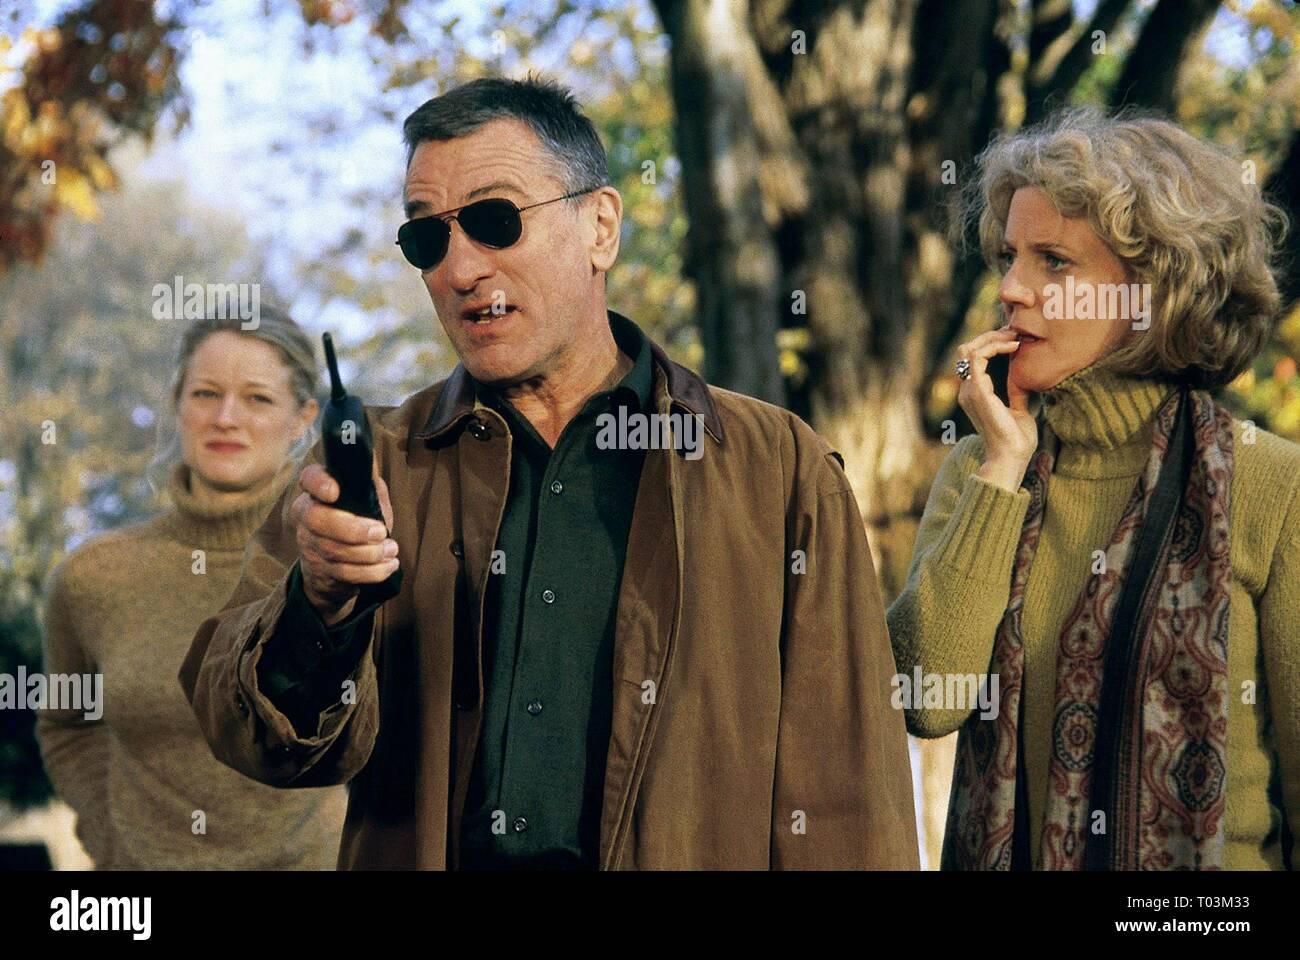 TERI POLO, ROBERT DE NIRO, BLYTHE DANNER, MEET THE PARENTS, 2000 - Stock Image